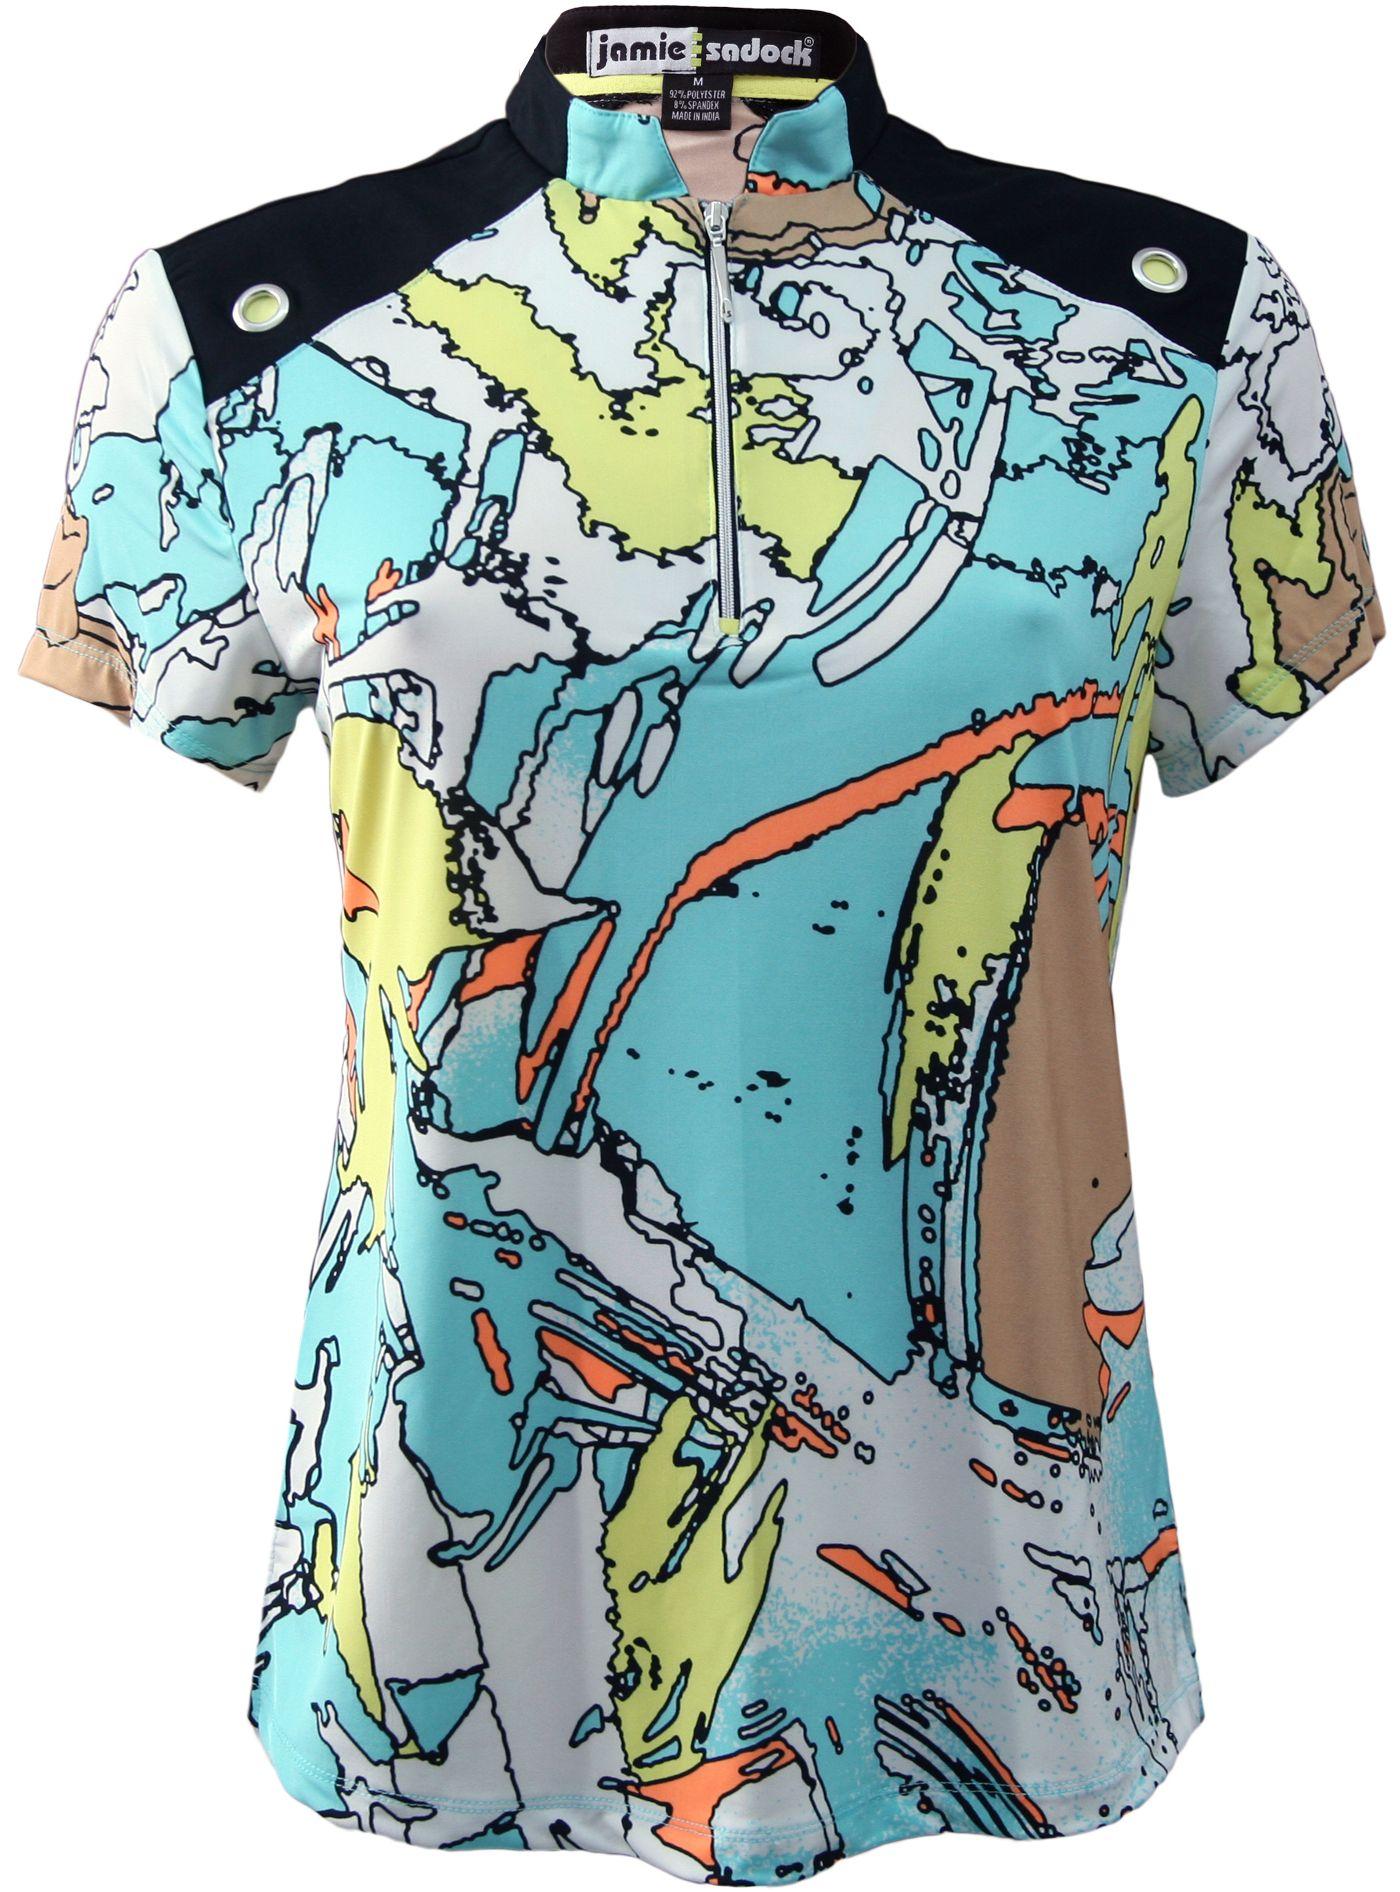 Jamie Sadock Women's Tsuanmi Print Short Sleeve Golf Top